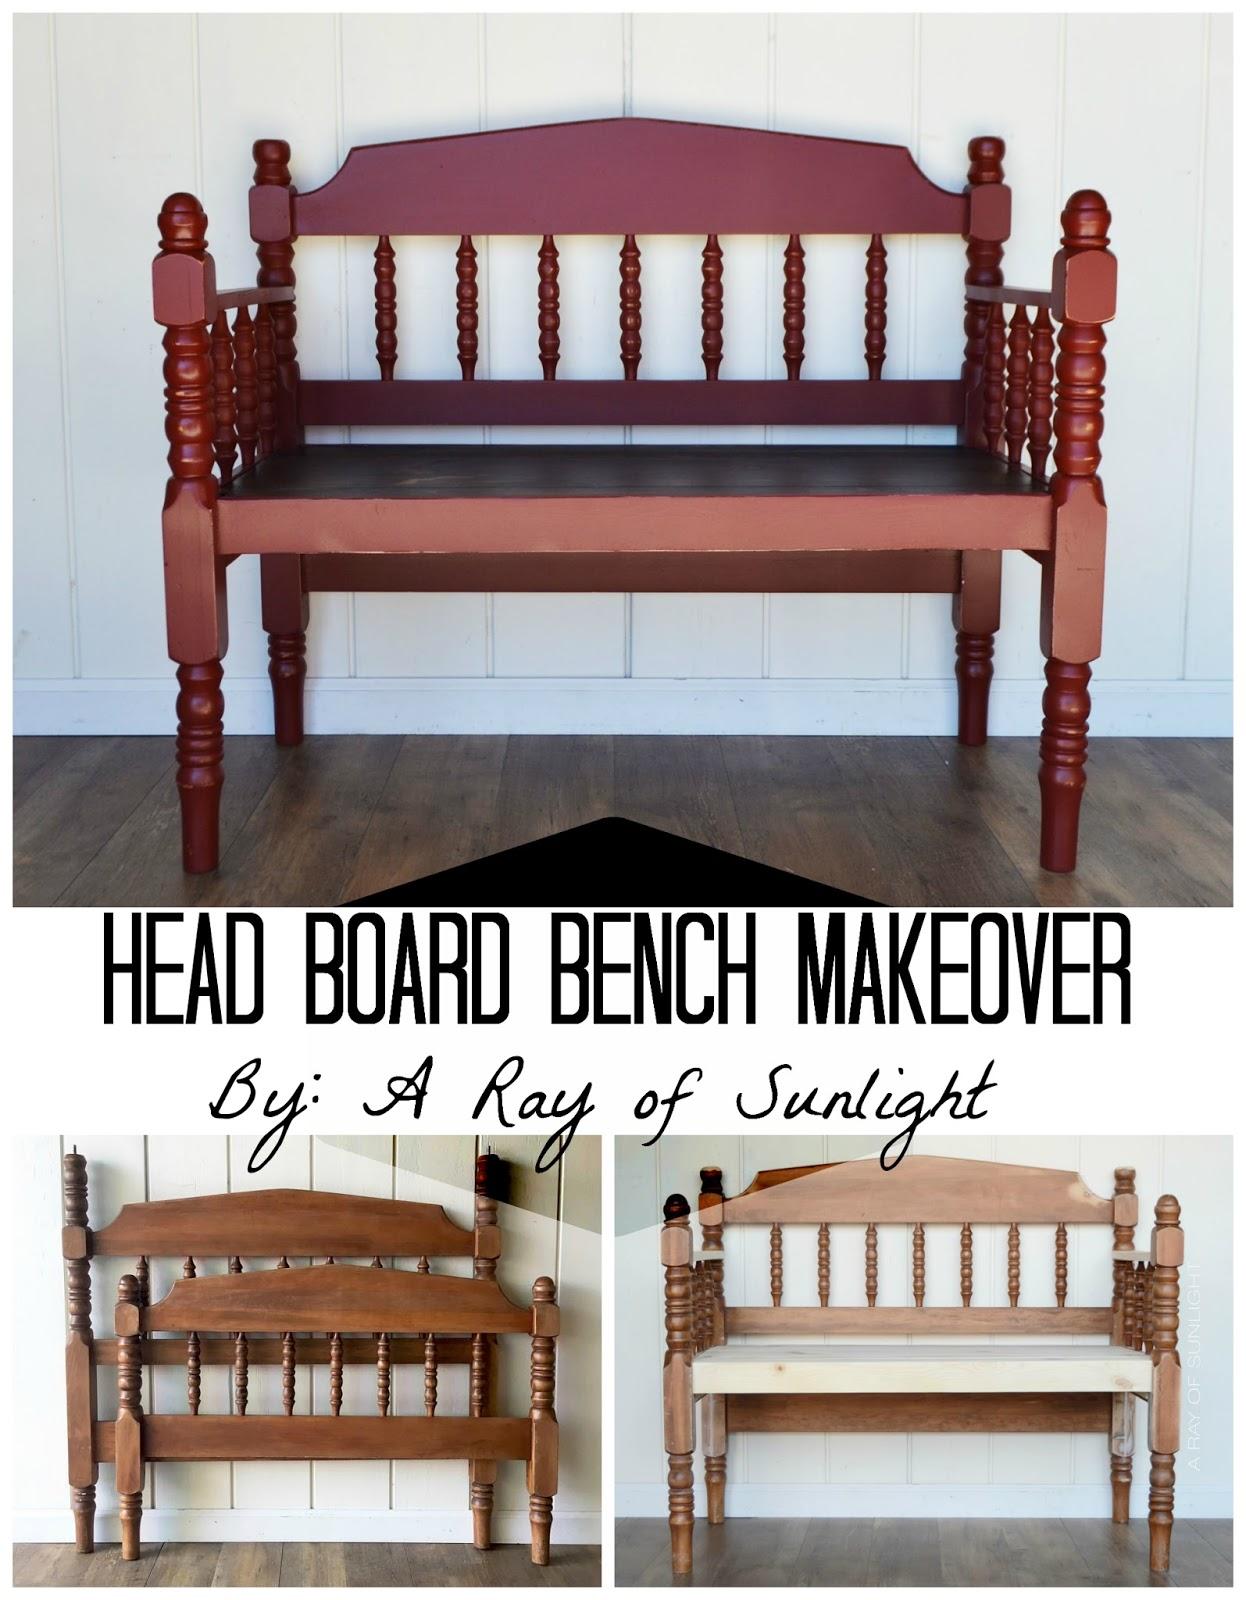 Vintage Headboard bench makeover